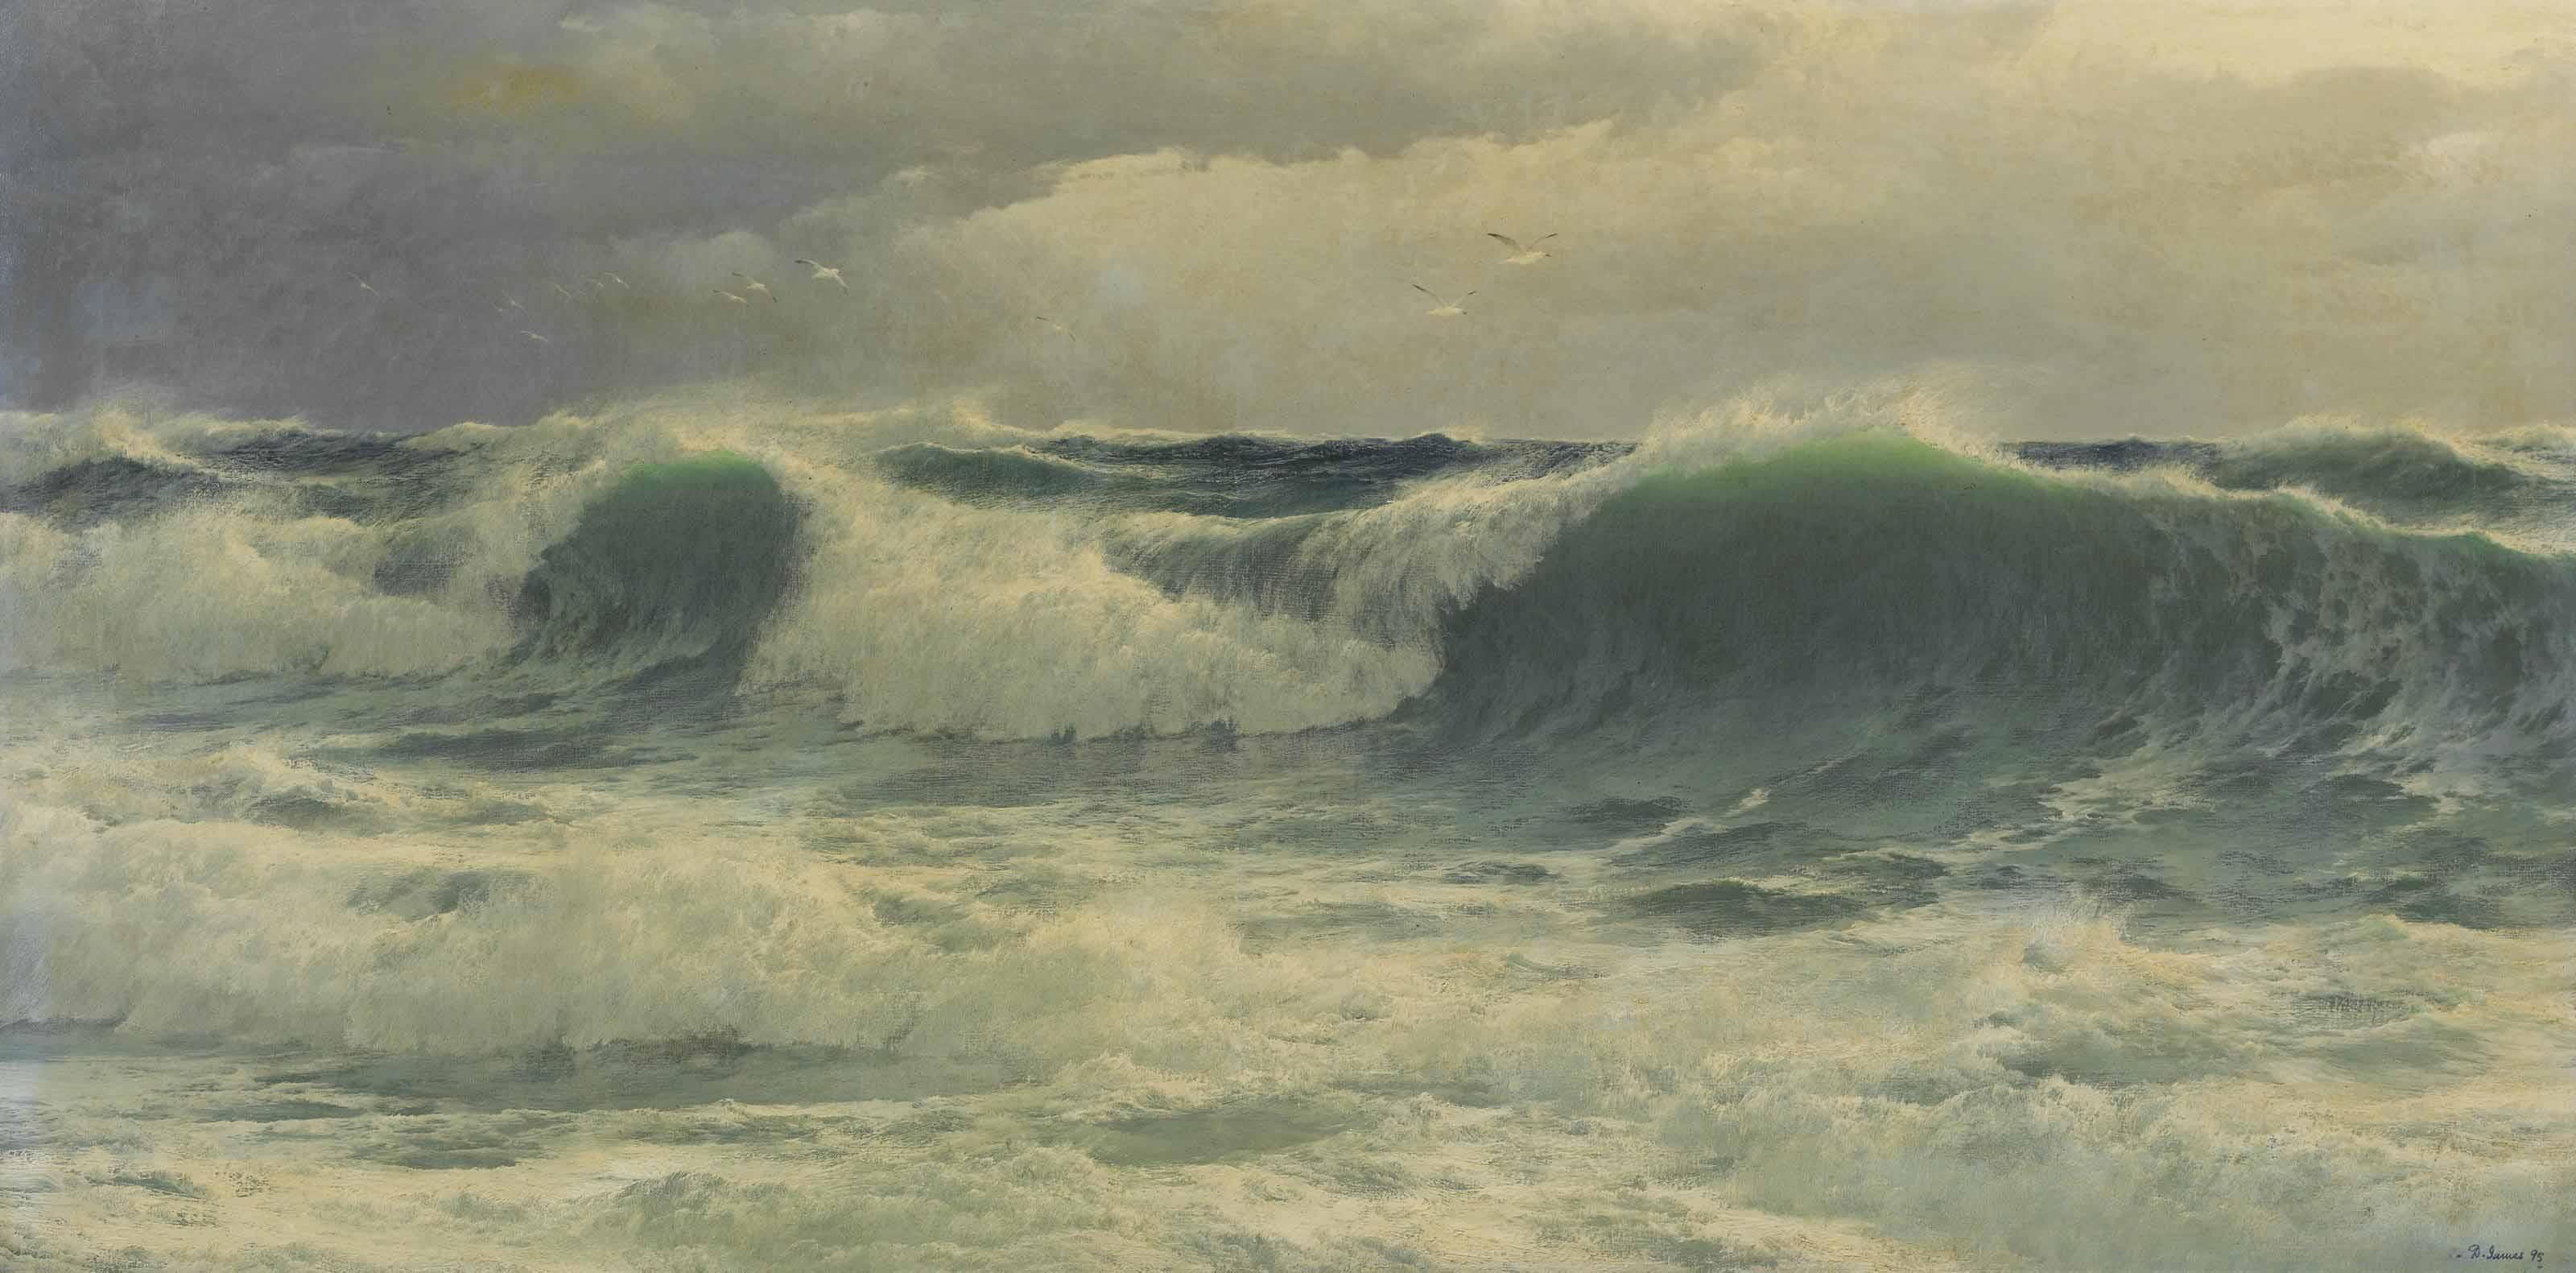 A ground sea